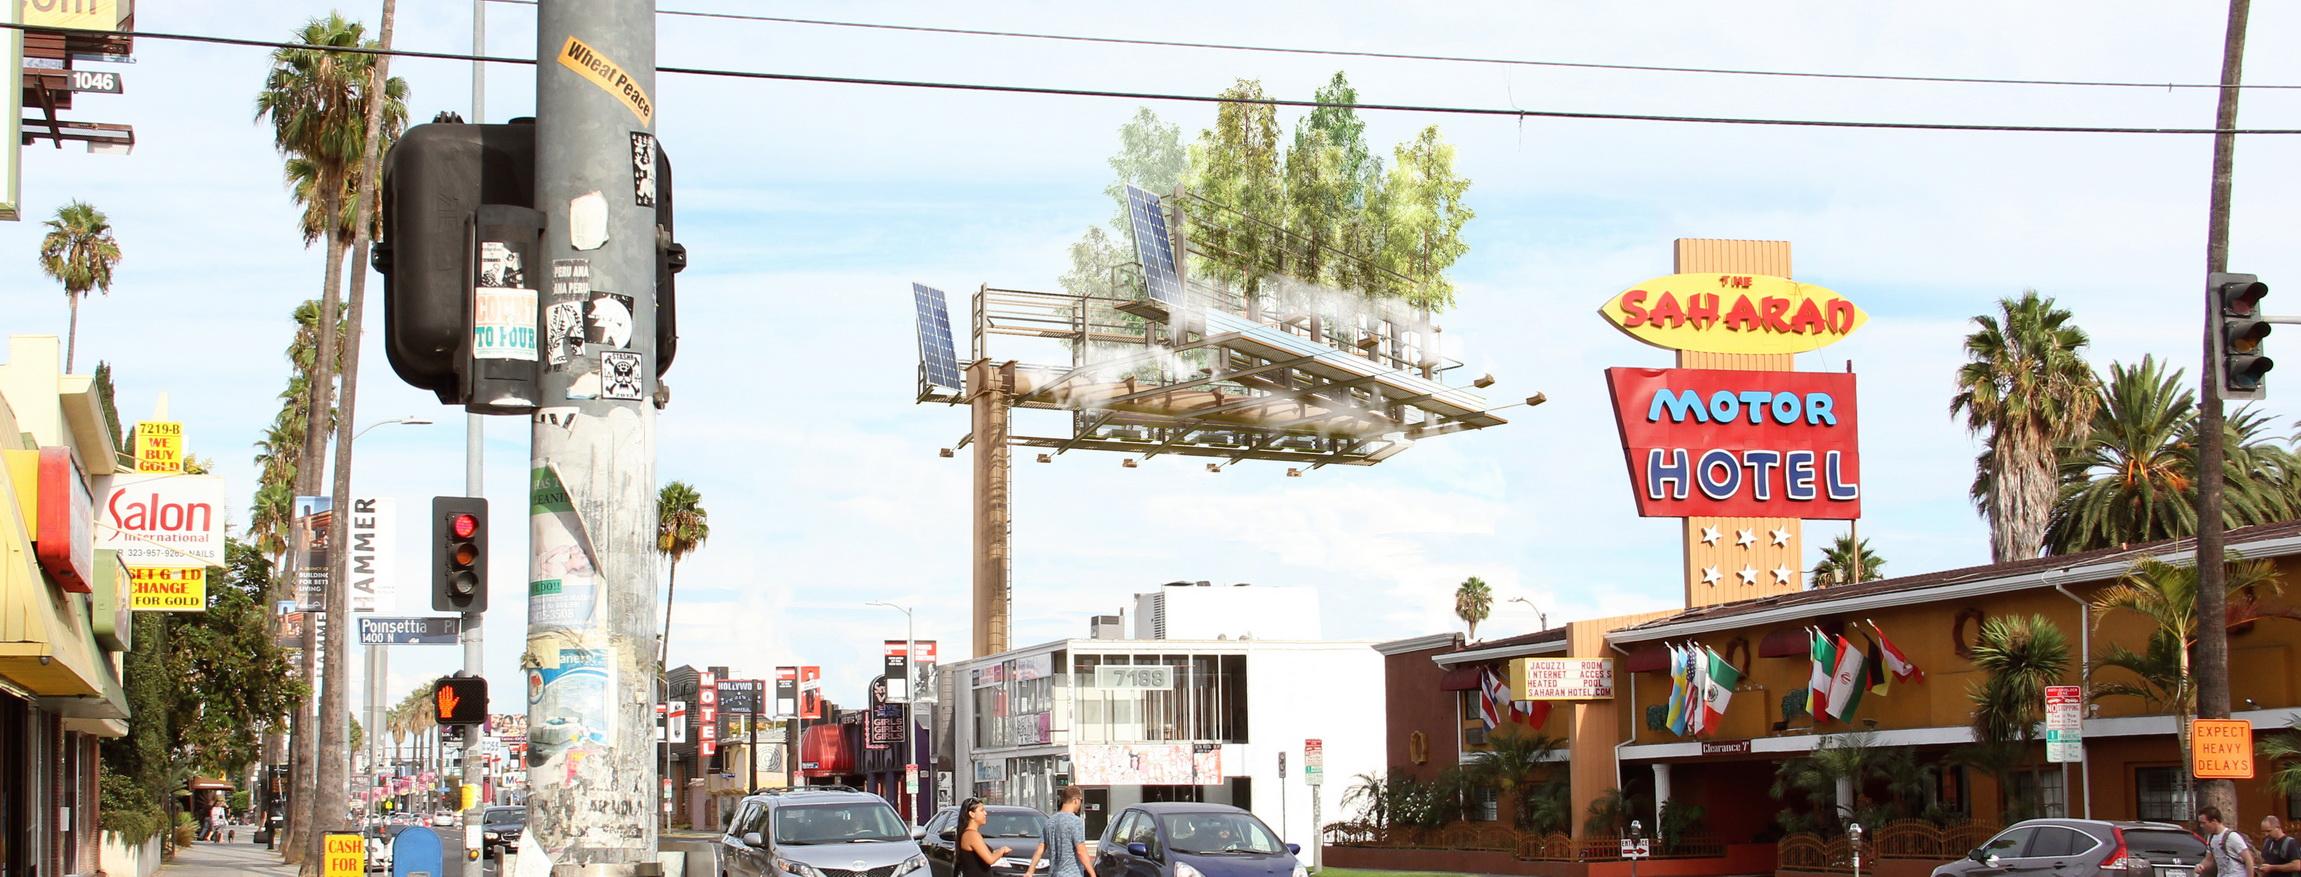 S.E.A.-Studio-Environmental-Architecture-David-Hertz-FAIA-Stephen-Glassman-Open-Air-Los-Angeles-sustainable-regenerative-restorative-green-infrastructure-design-bottle-filling-station-upcycle-billboard-advertising-speculative-art-sculpture-bamboo-5.jpg